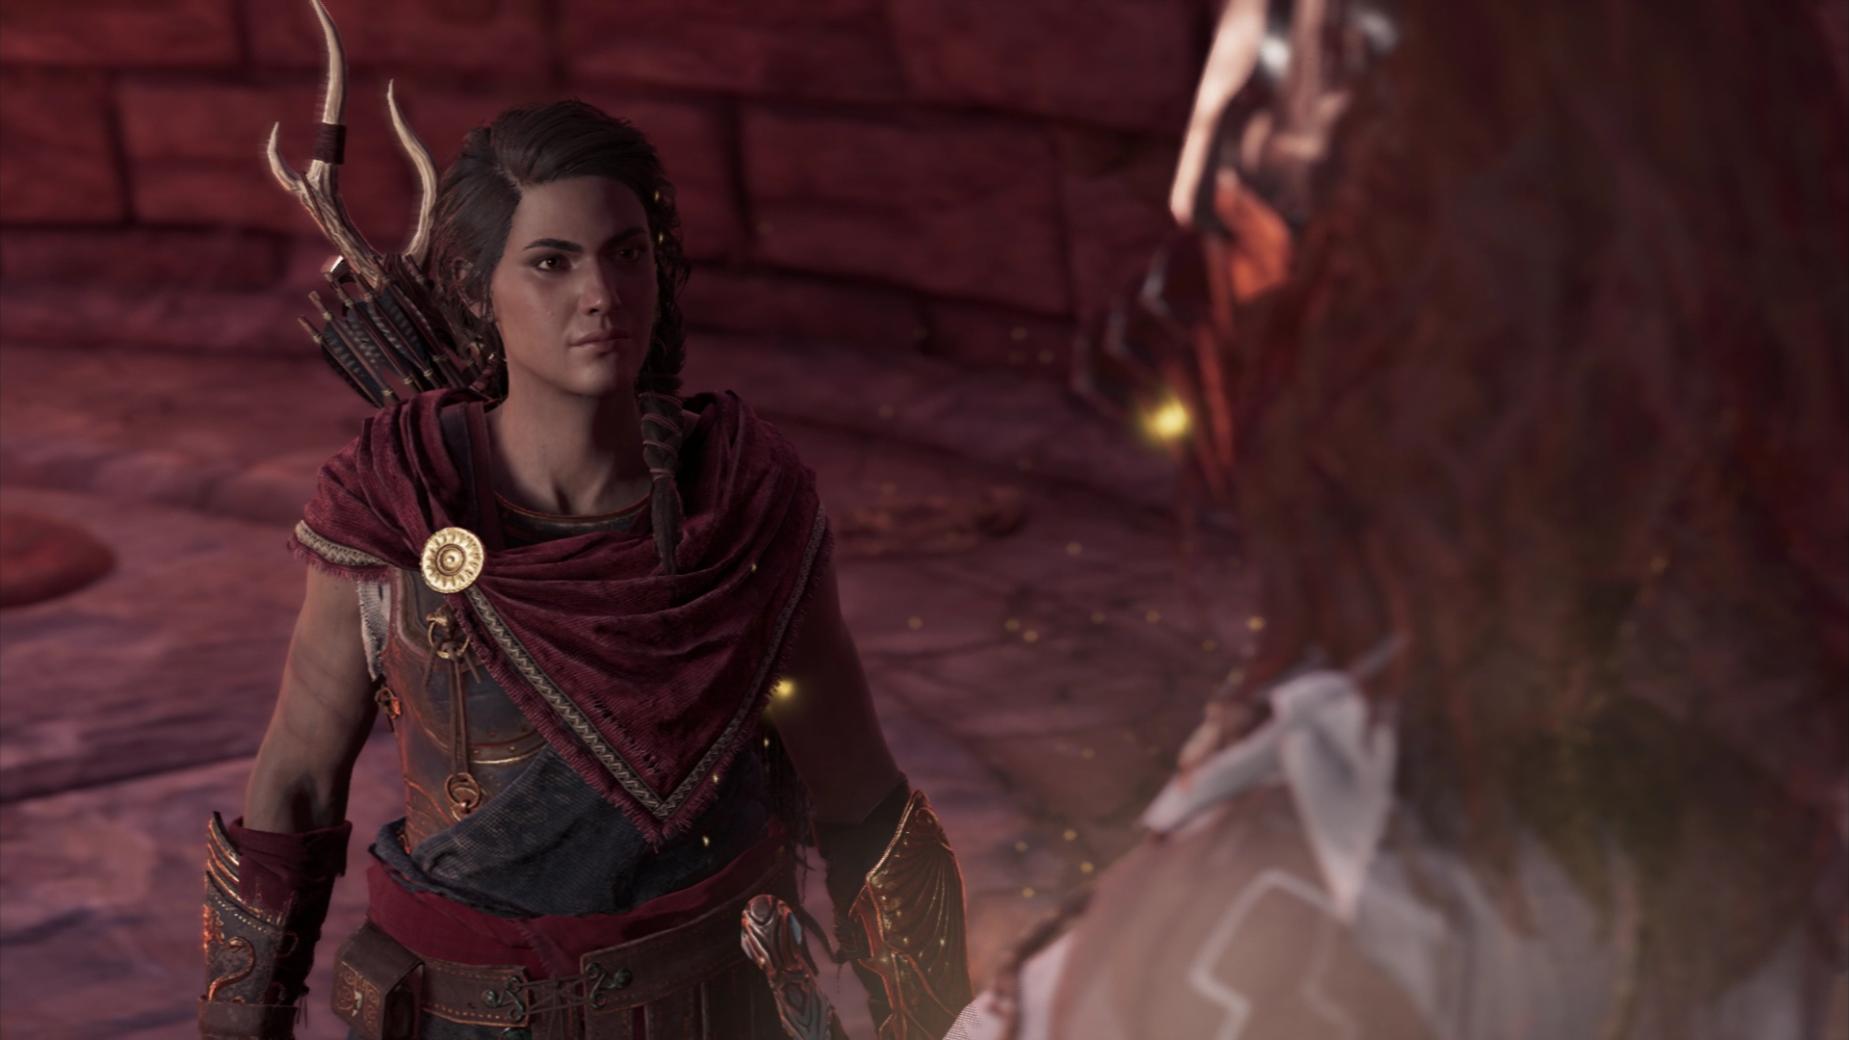 Orion S Symbol Assassin S Creed Wiki Fandom